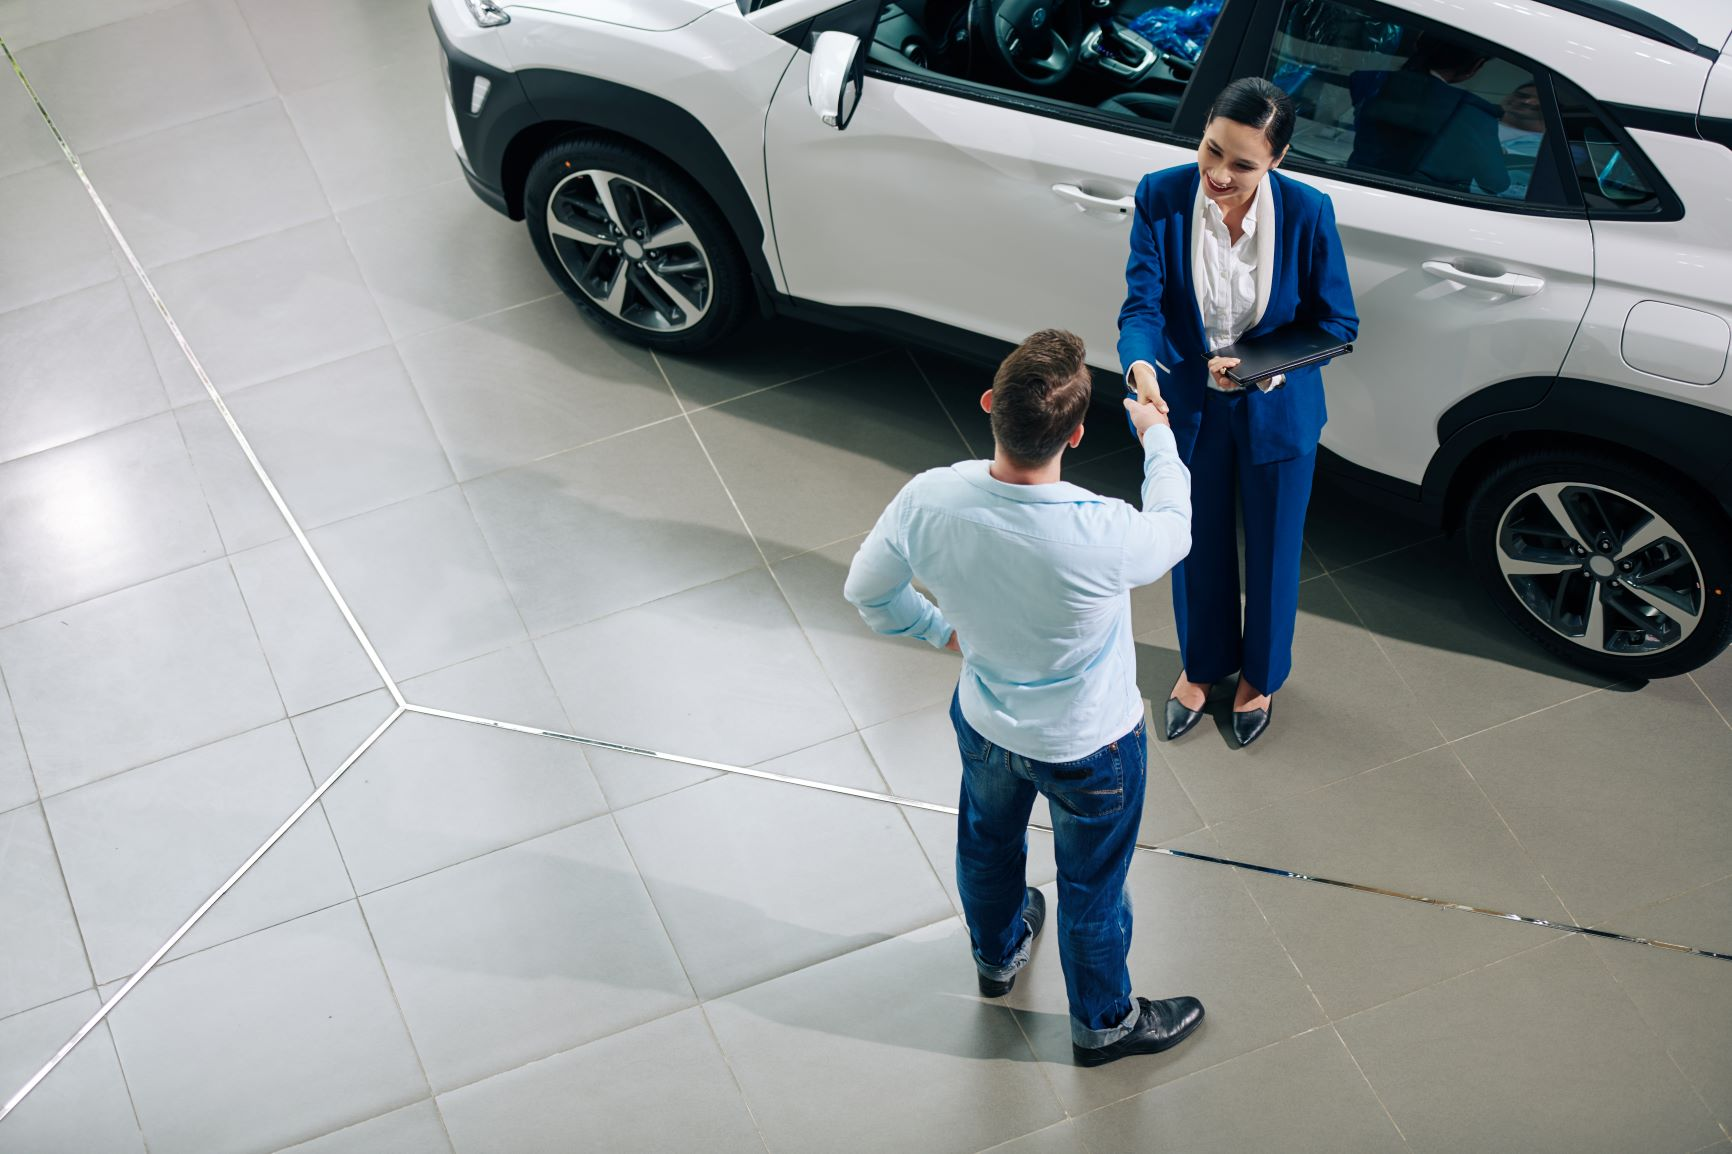 female car salesperson talking to man at dealership